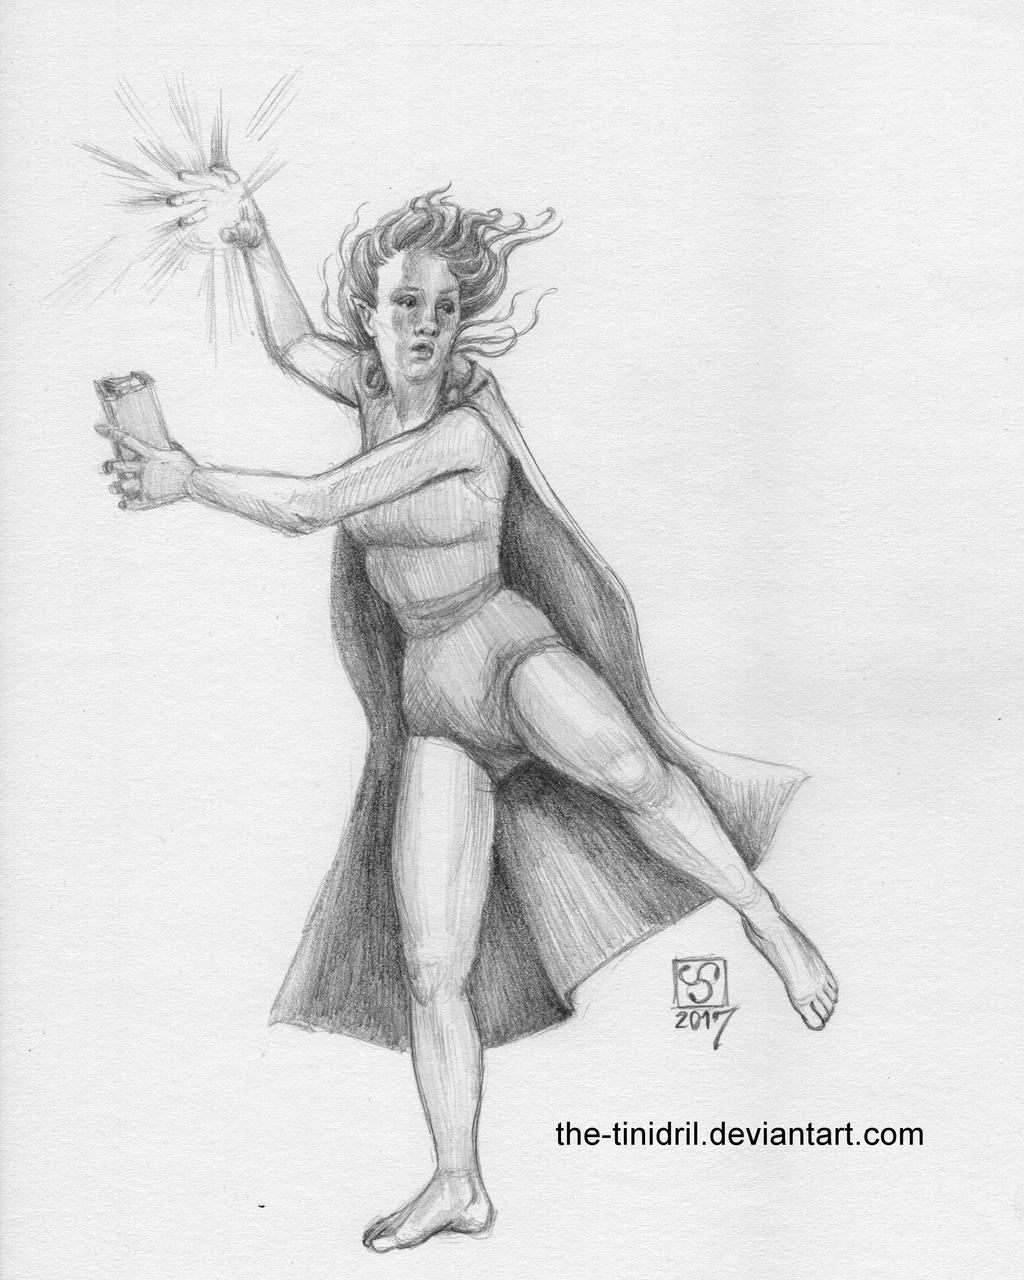 Lore Bender - 20-DrawEverythingJune2 by The-Tinidril